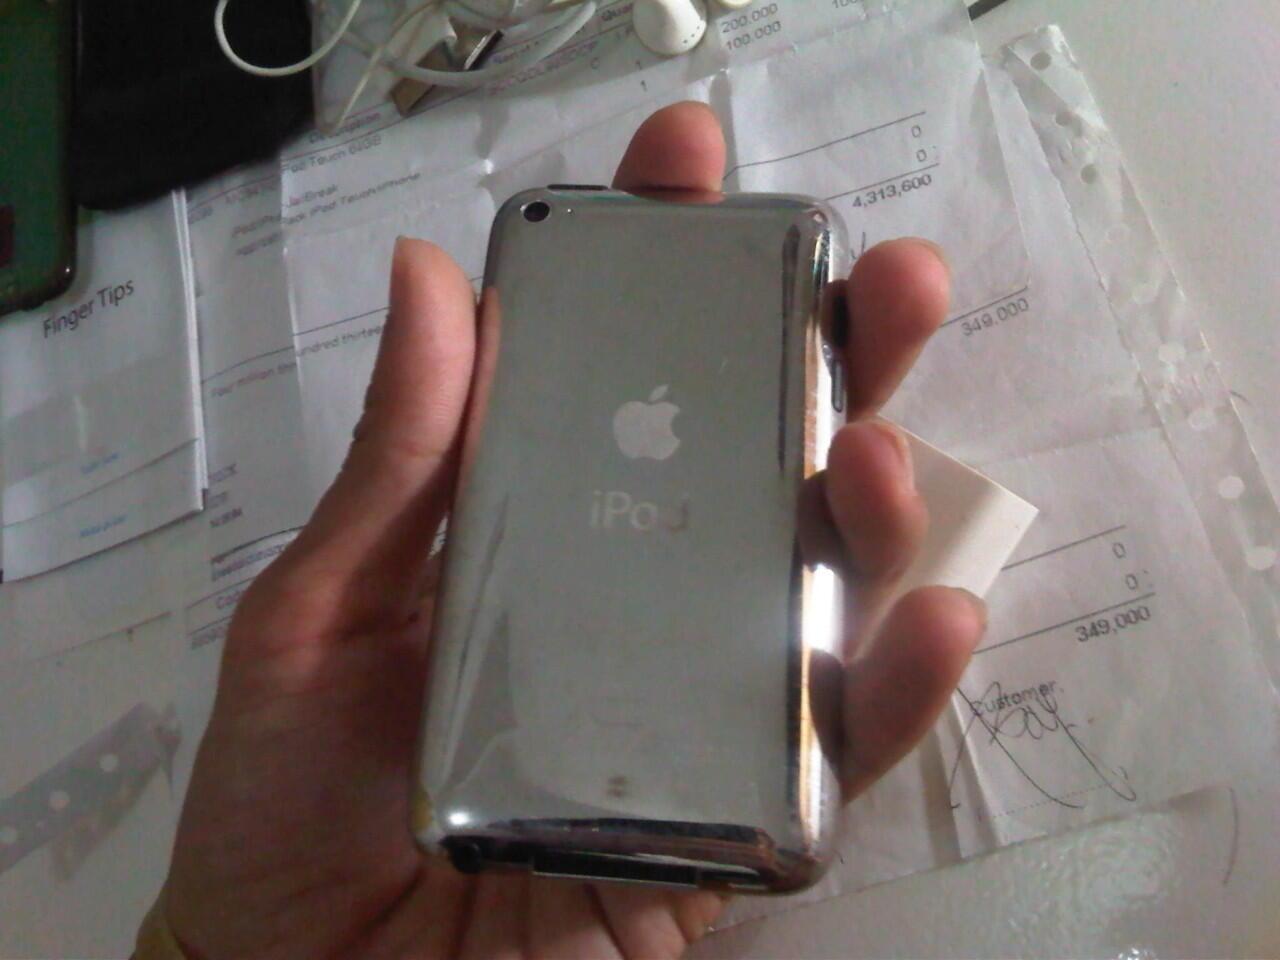 Jual Ipod Touch 4th gen 64GB + bonus banyak COD Surabaya